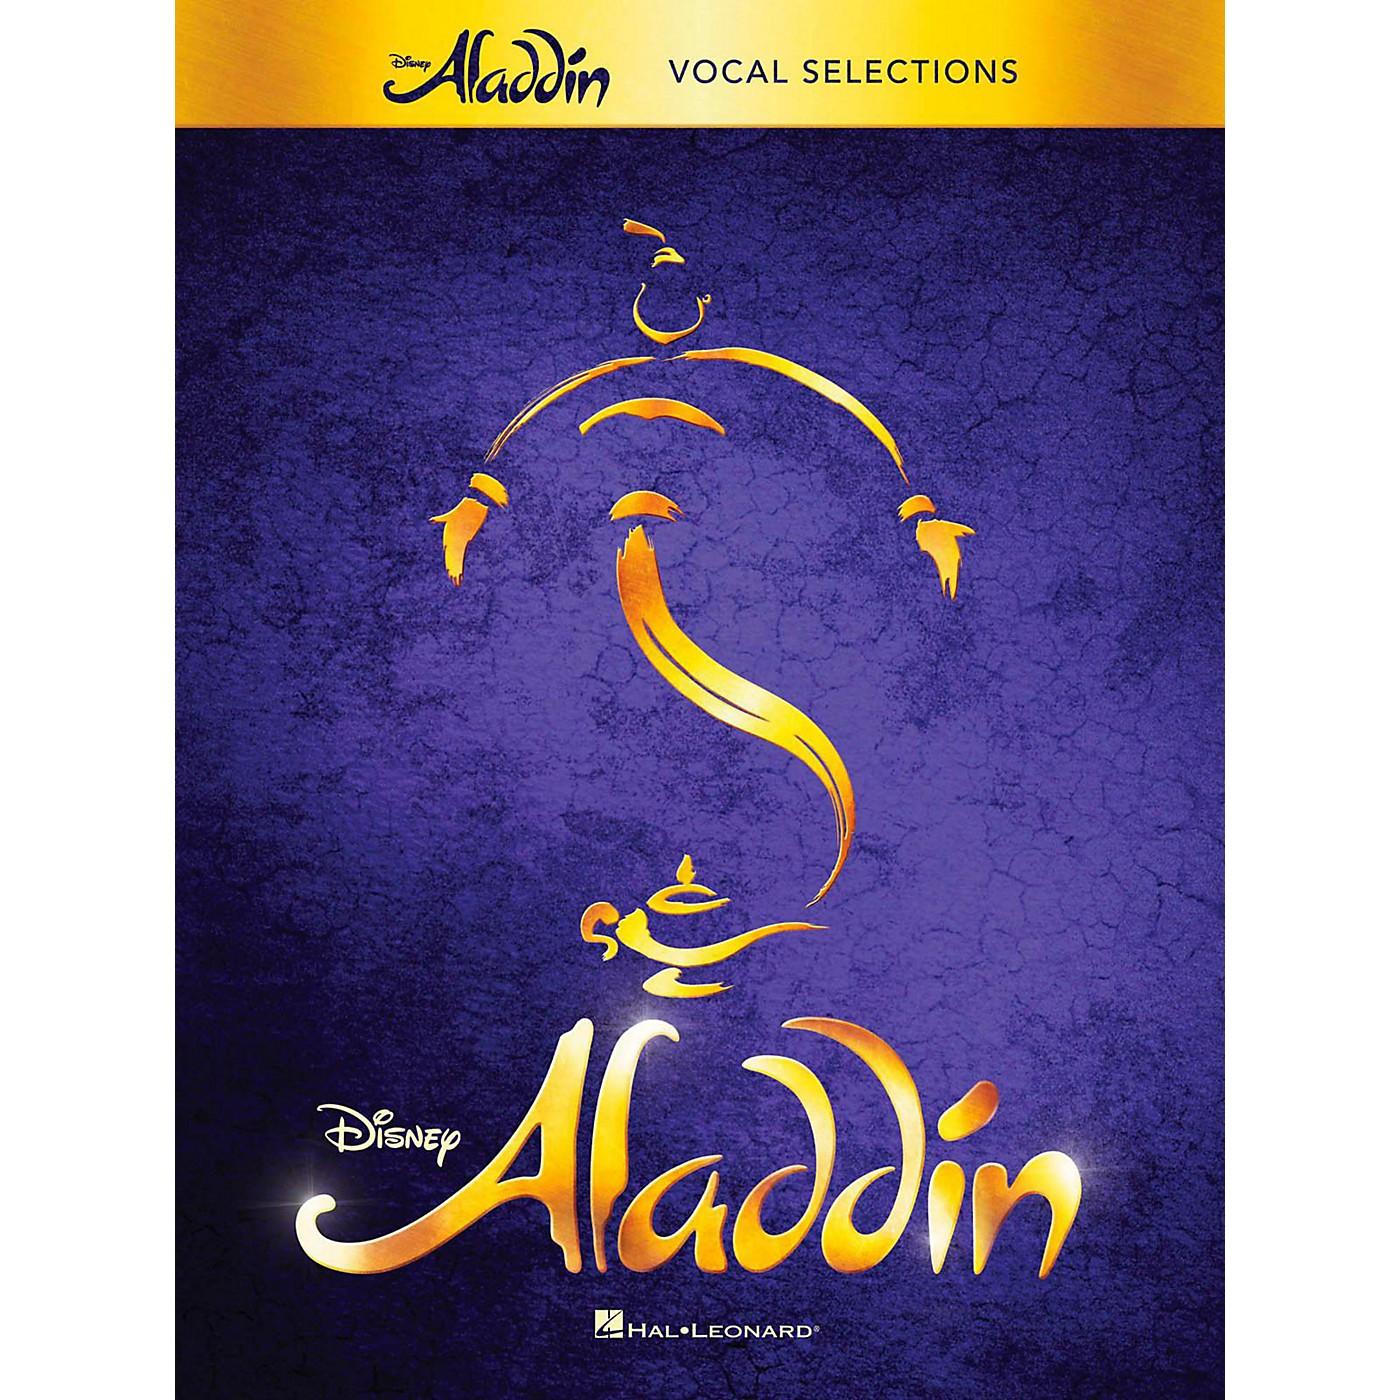 Hal Leonard Aladdin - Broadway Musical Vocal Selections w/ Piano Accompaniment thumbnail